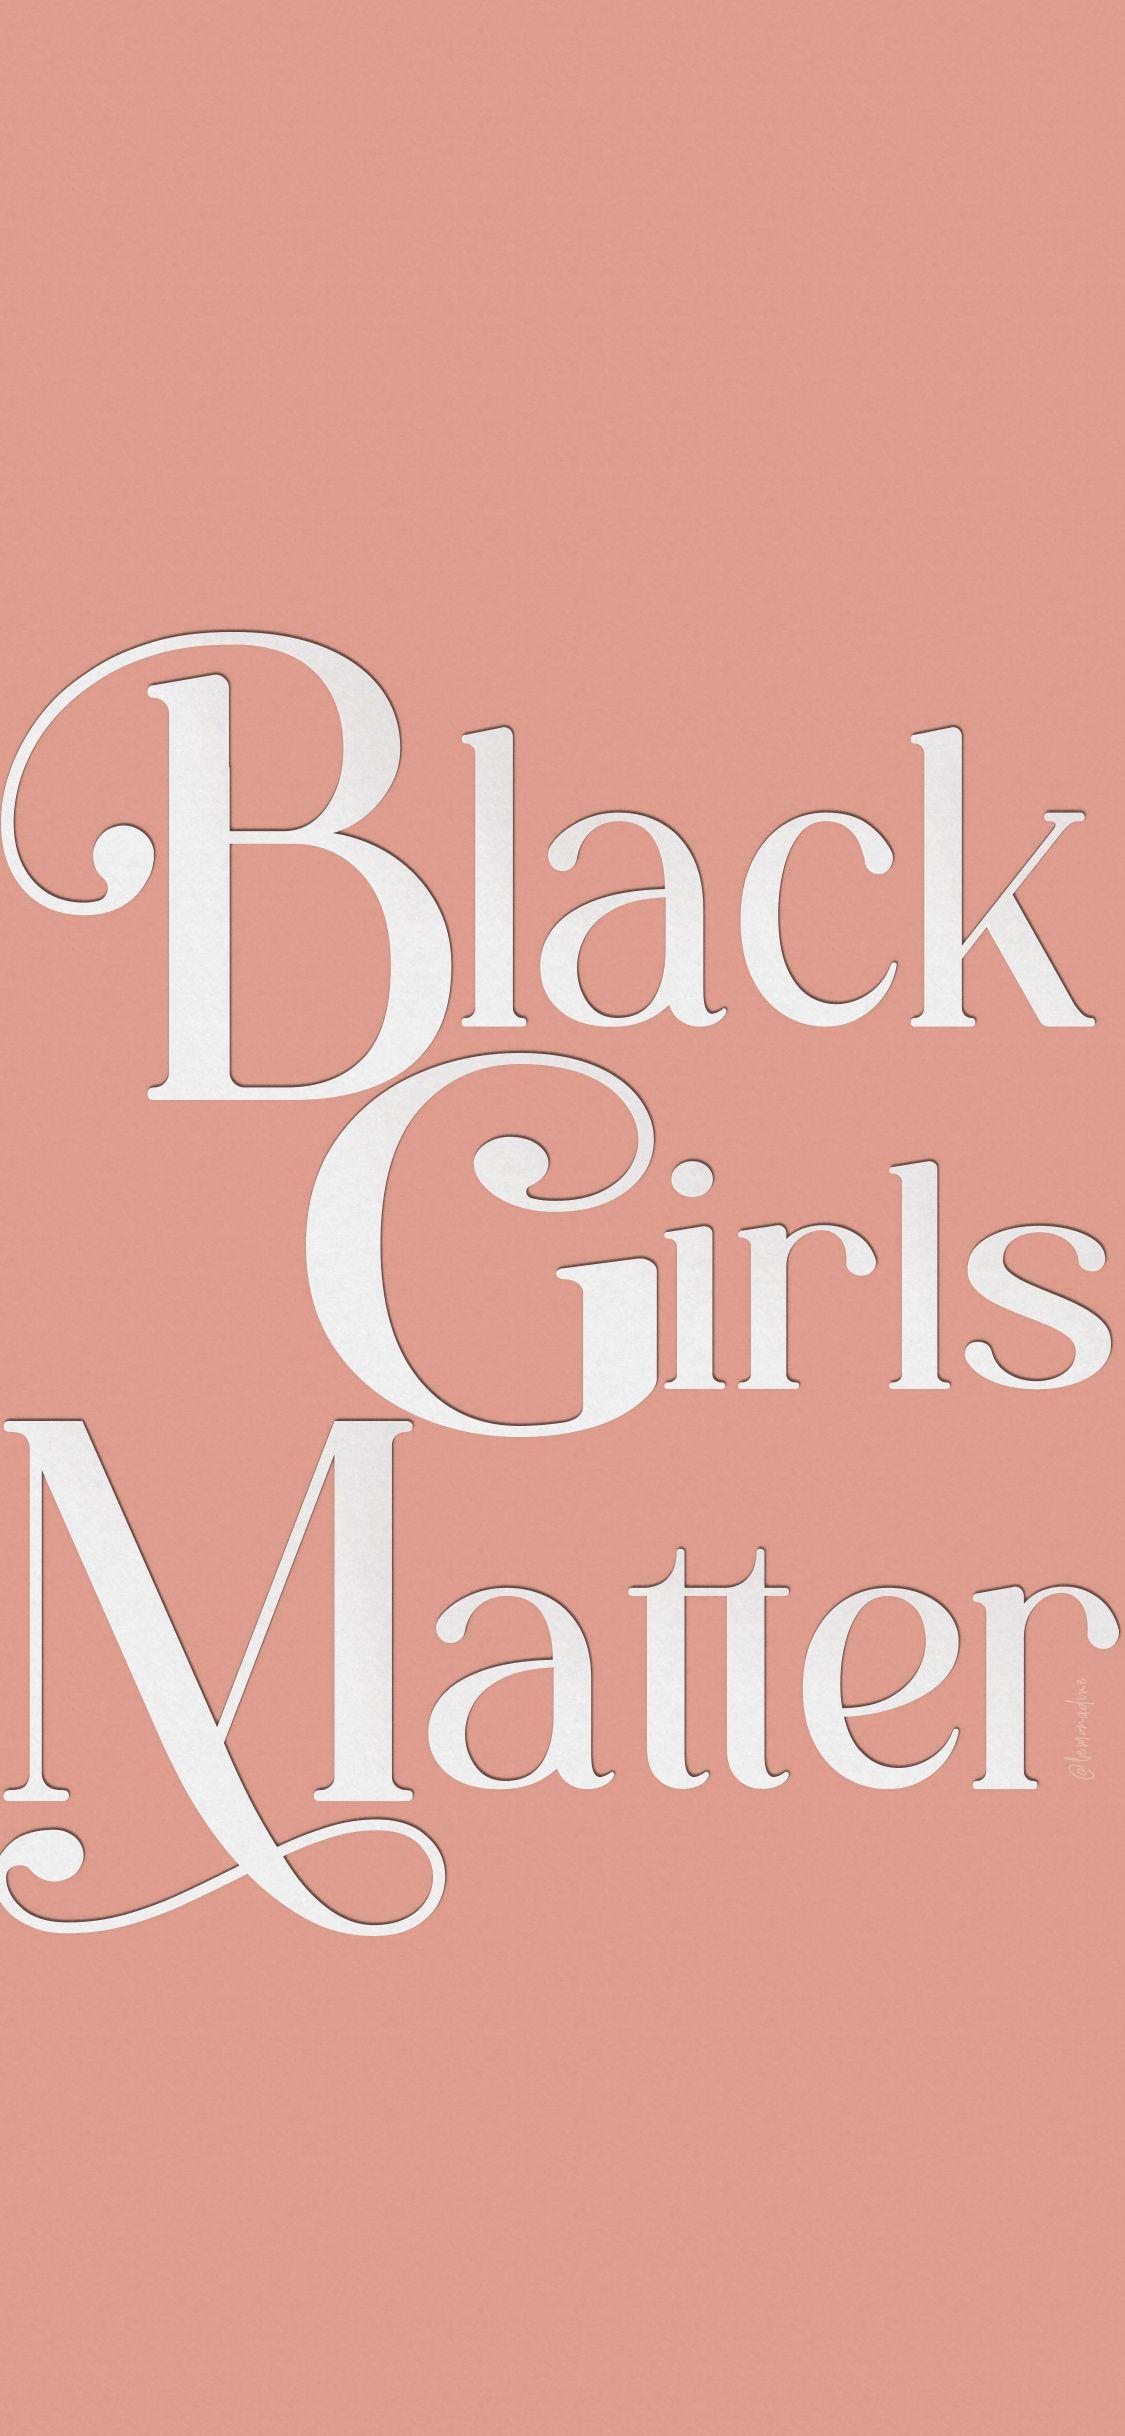 Black Girls Matter in 2020 Black lives matter quotes